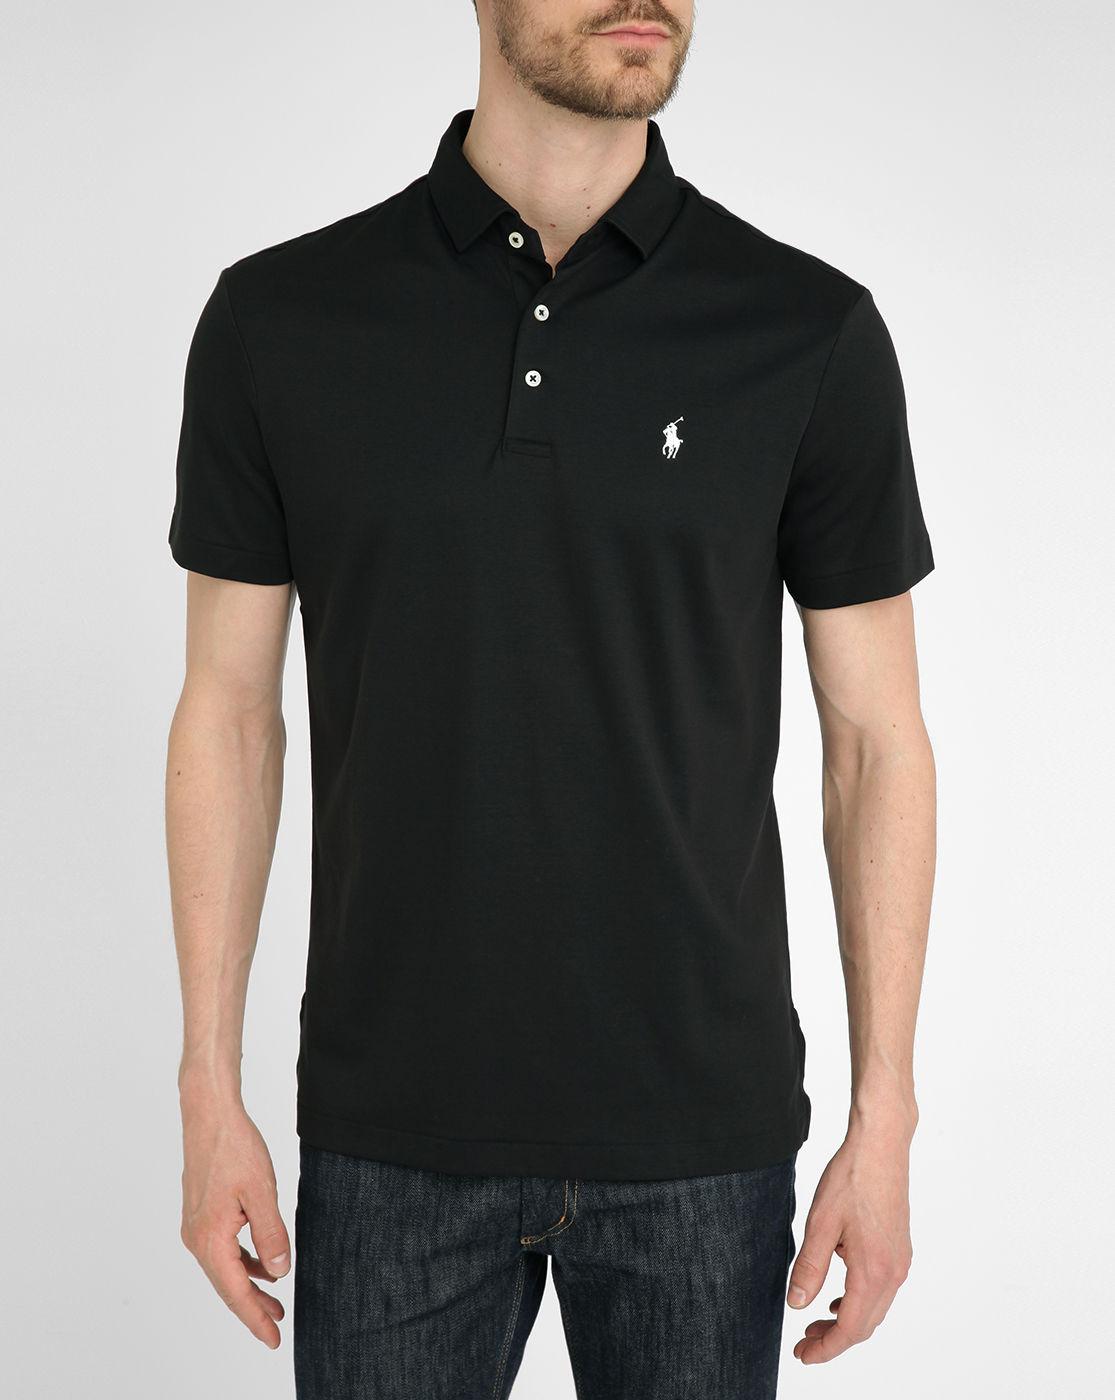 Polo ralph lauren black jersey polo shirt in black for men for Ralph lauren polo jersey shirt